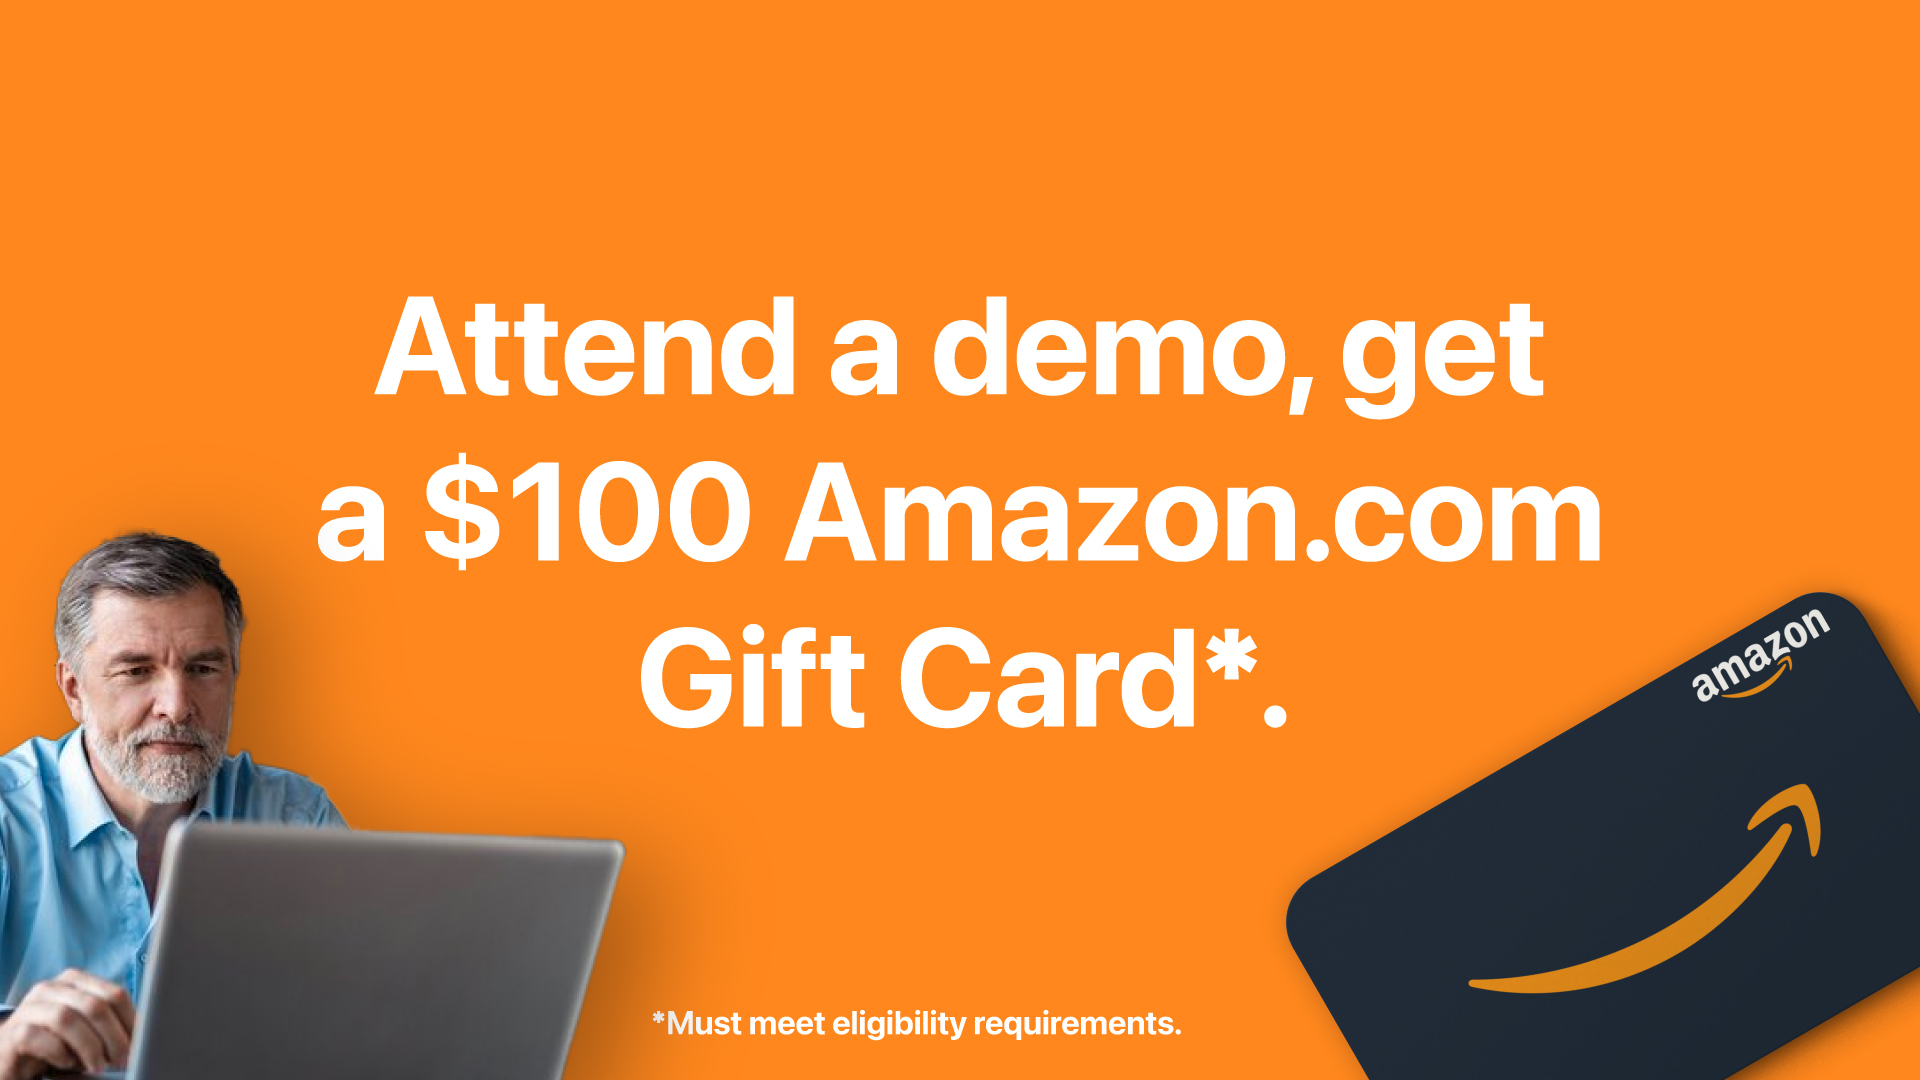 Get $100 Gift Card for attending a Raken Demo